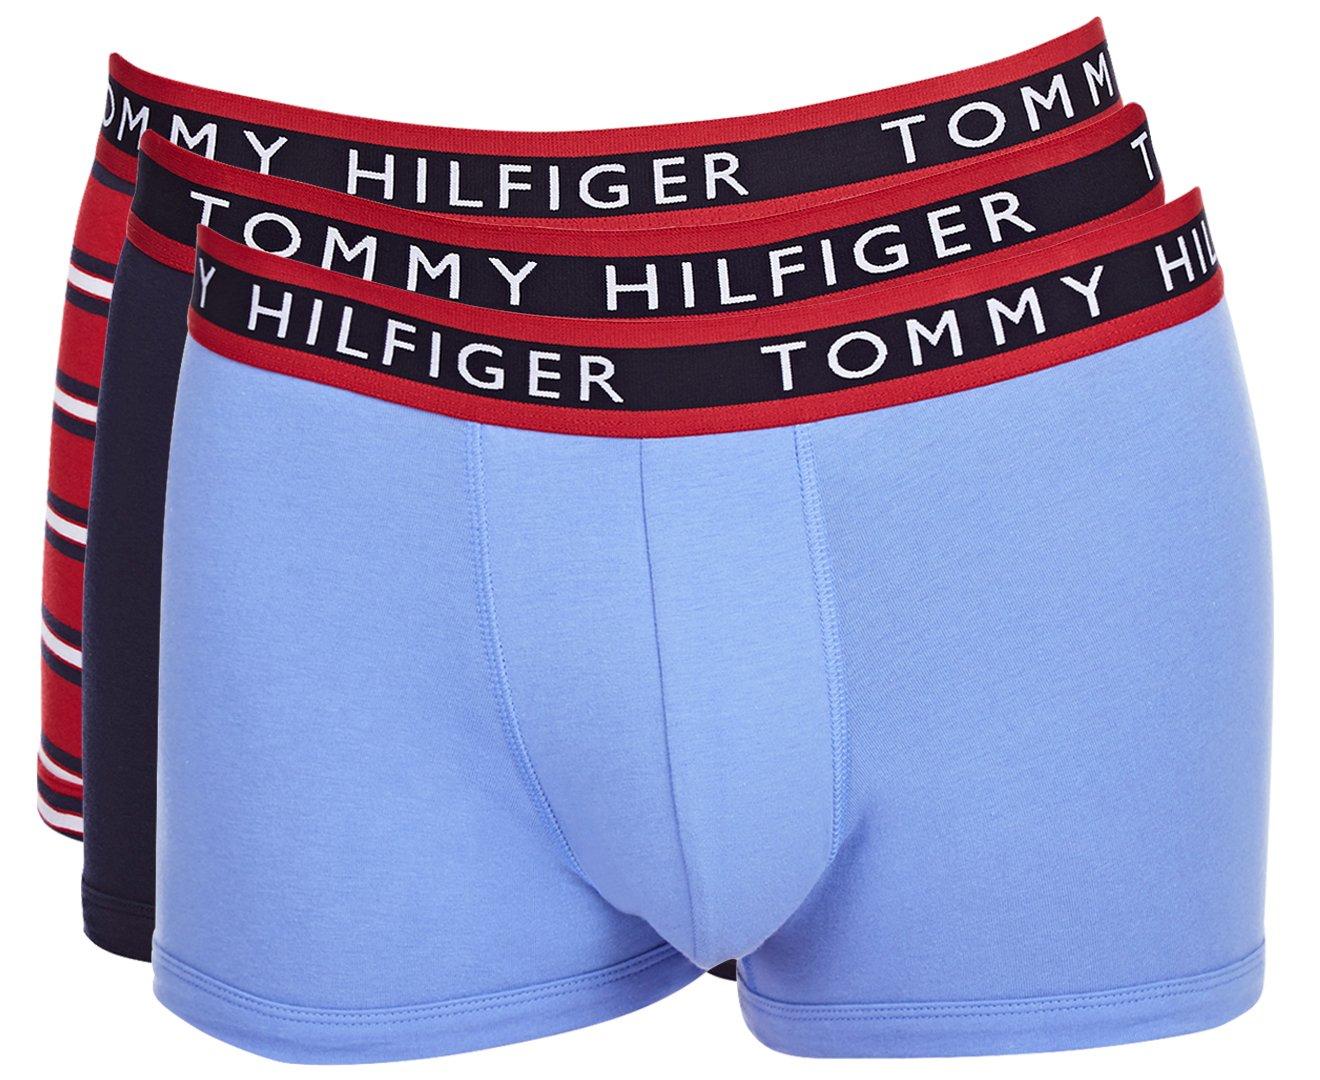 TOMMY HILFIGER (トミーヒルフィガー) ボクサーパンツ 3枚セット 09T0963 B06X9JN2QM X-Large|レンガ レンガ X-Large